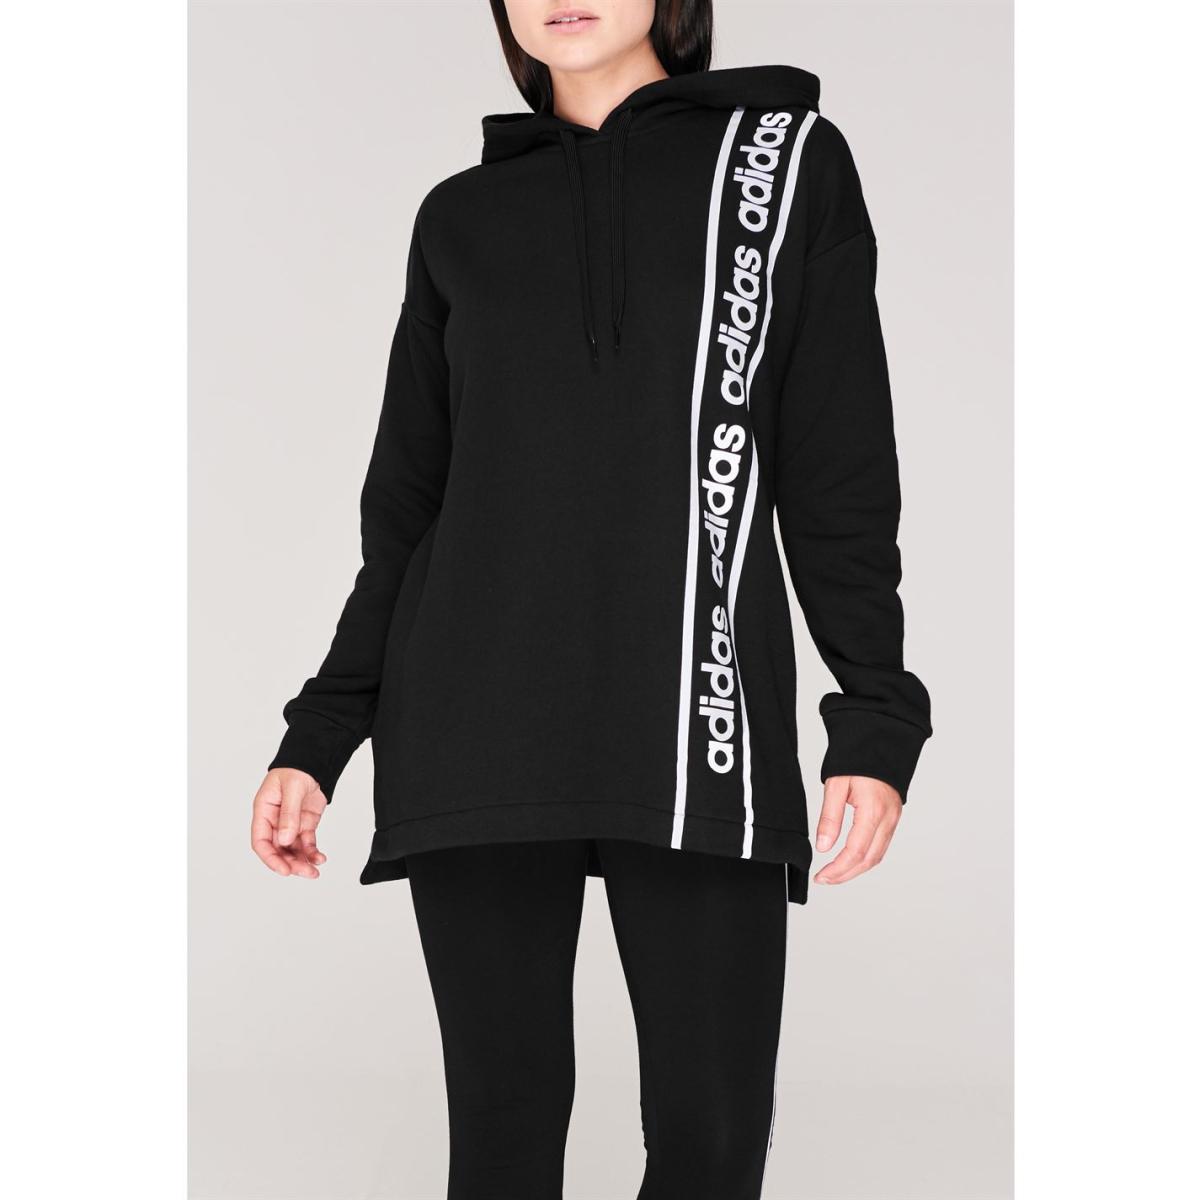 adidas C90 Kapuzenjacke Jacke Kapuzenpullover Damen Sweatshirt Pullover 4279